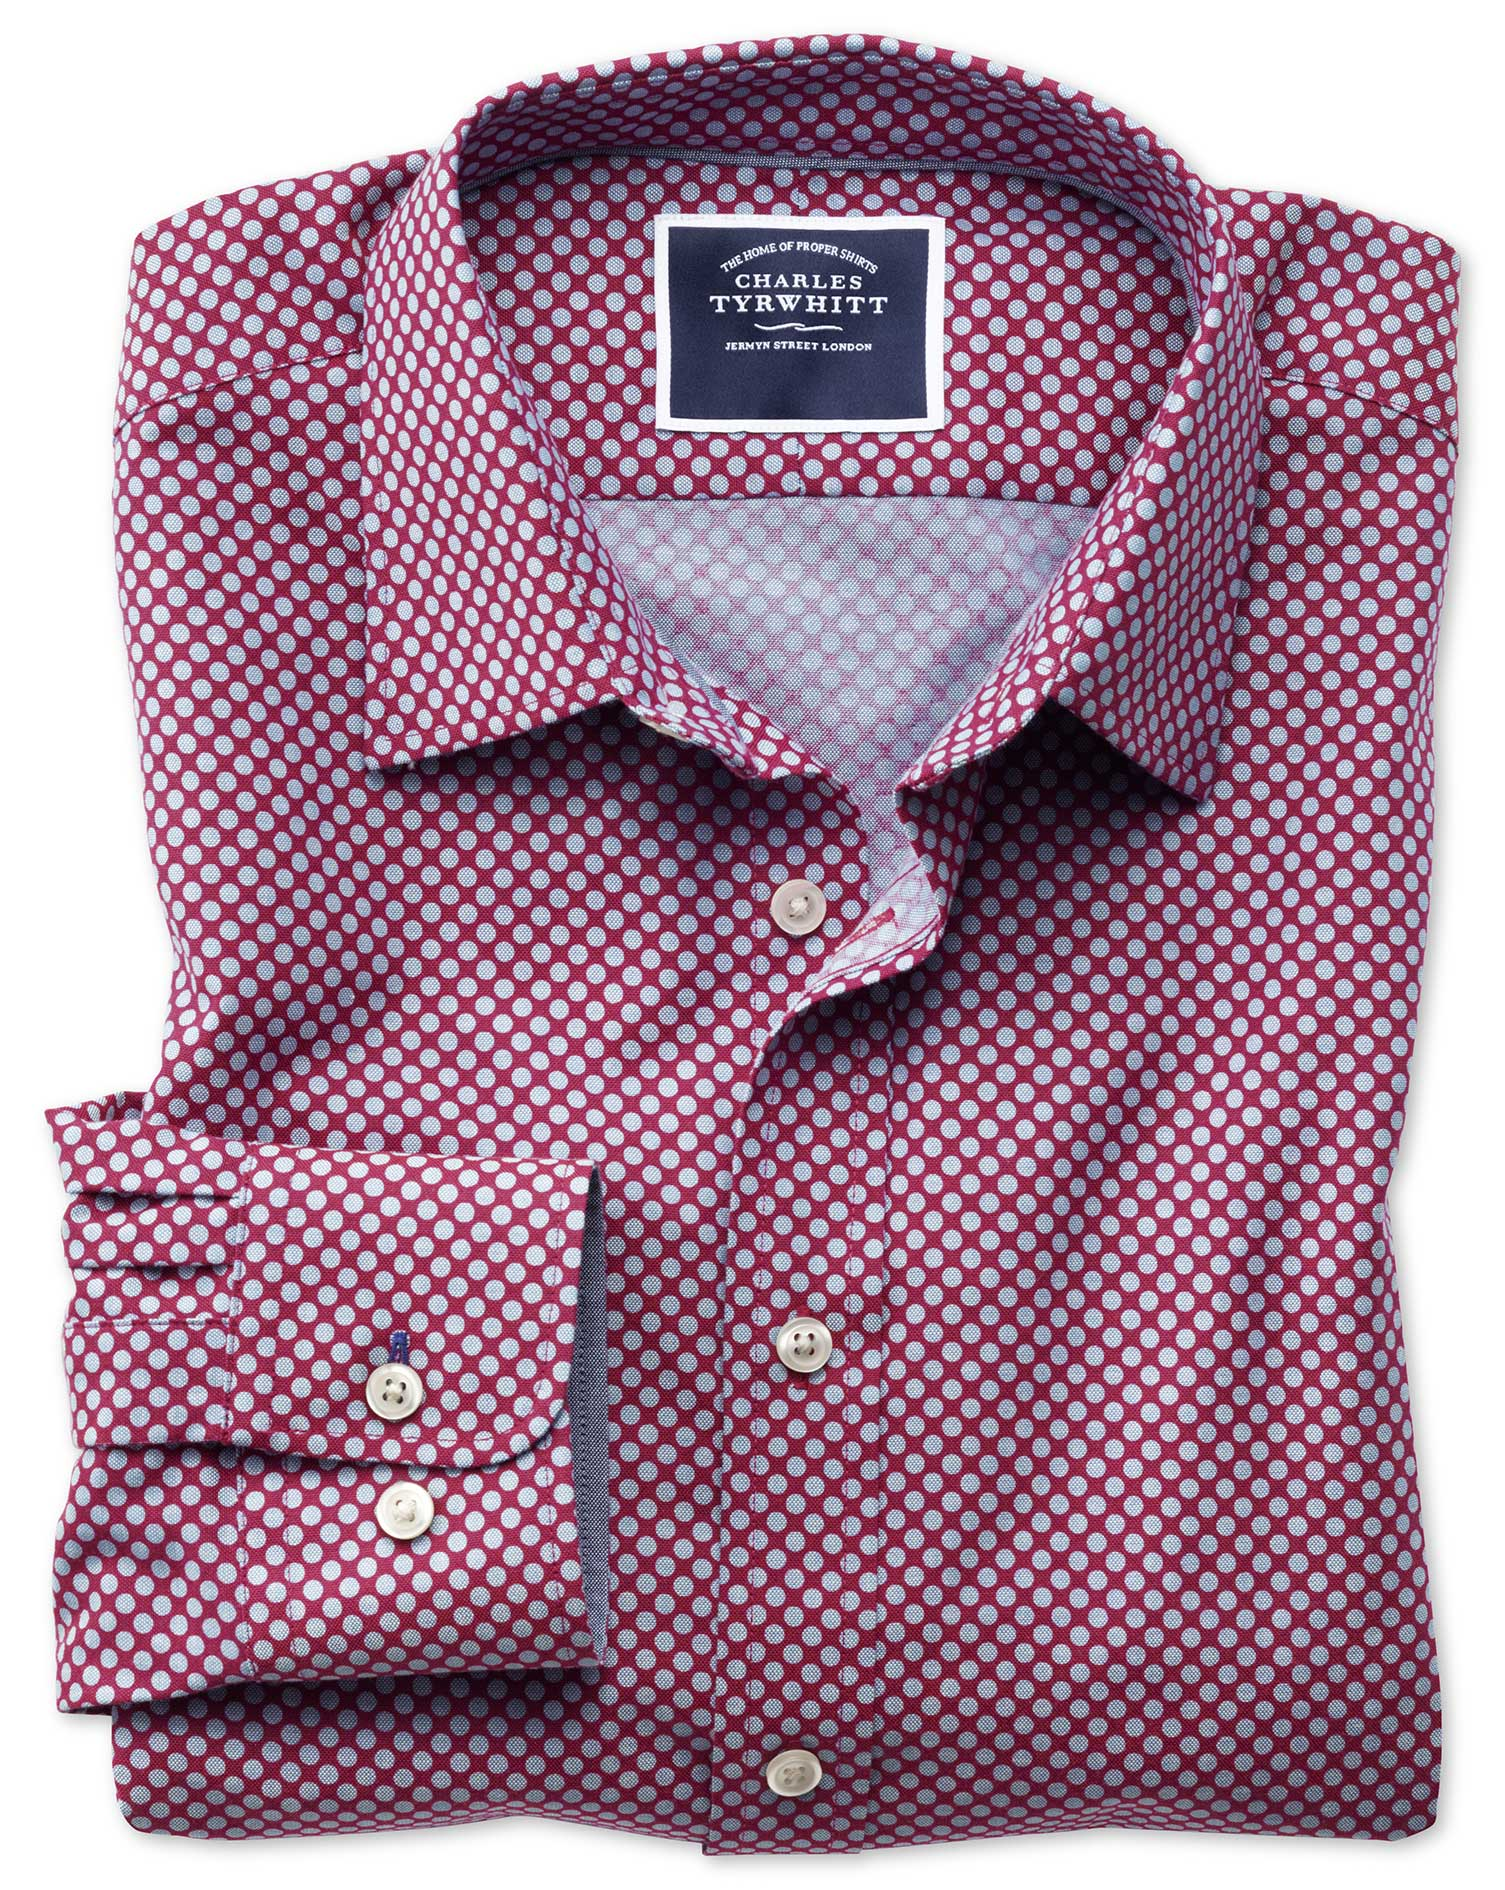 Classic Fit Non-Iron Chambray Berry Spot Print Cotton Shirt Single Cuff Size XXL by Charles Tyrwhitt